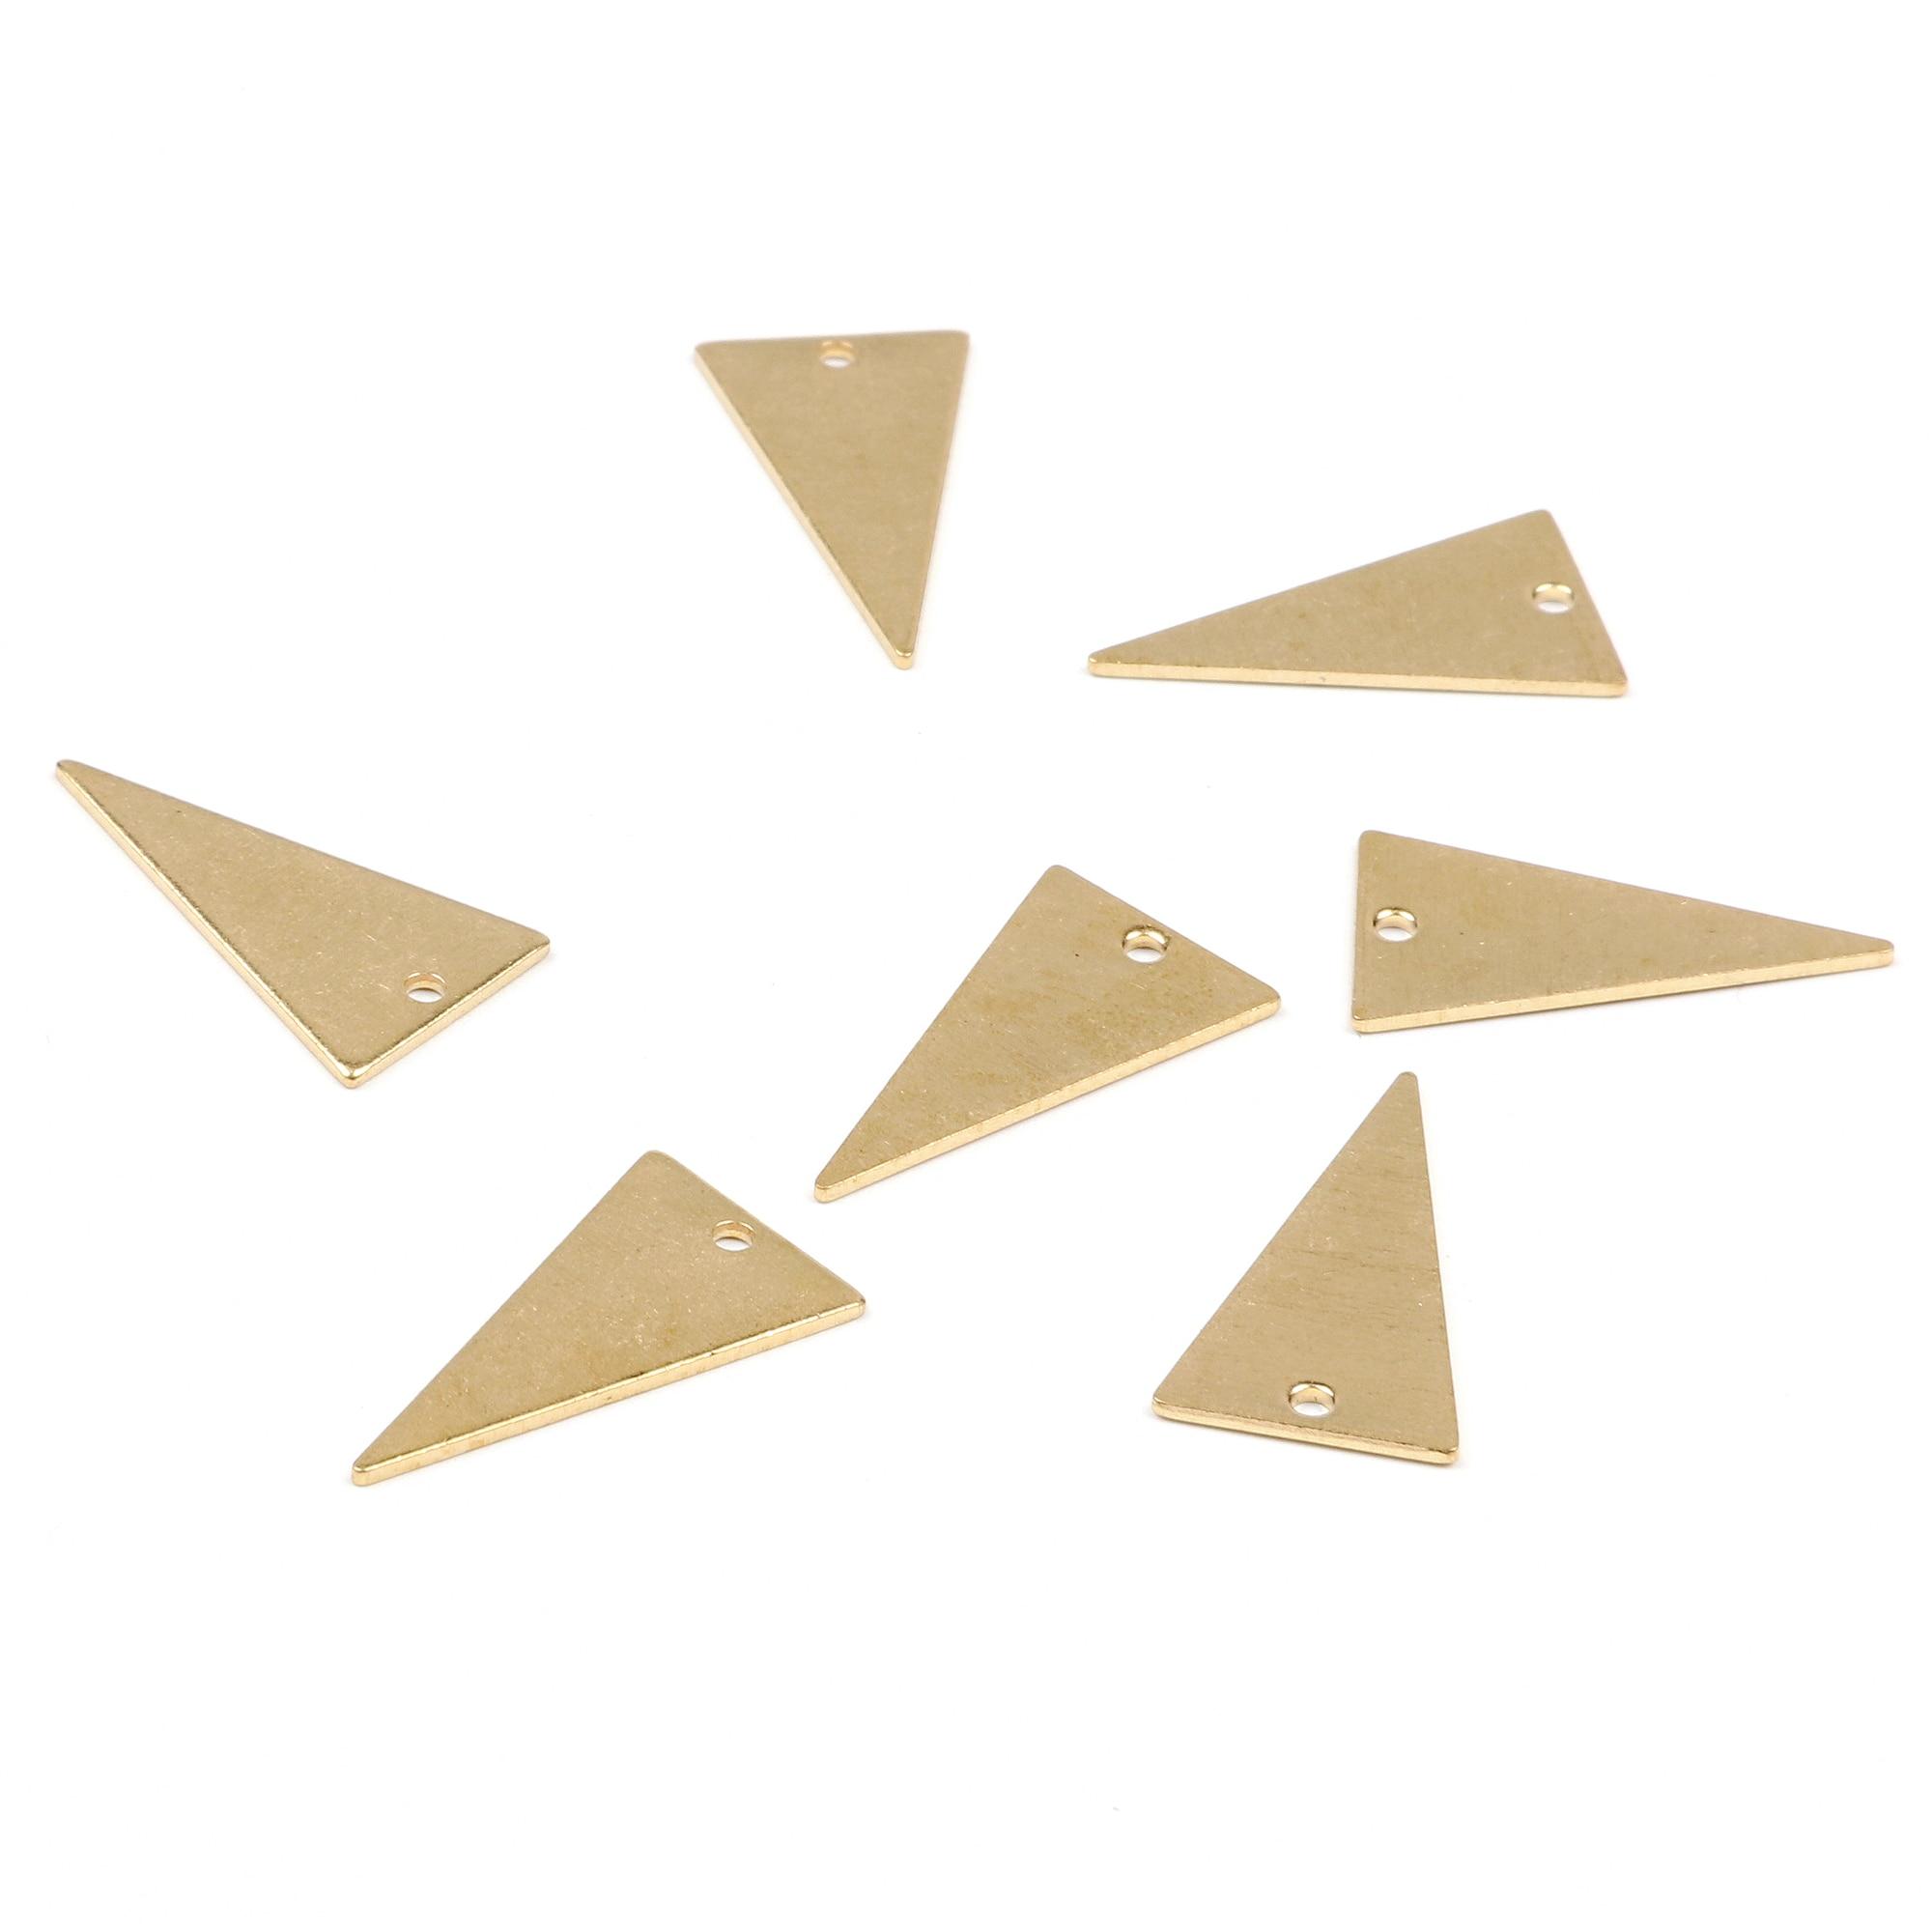 Messing Geometrie Charme, Raw Messing Ohrringe Erkenntnisse, Raw Messing Anhänger, Dreieck Ohrringe Messing Charme, 20,5 mmx 11,5 mm-RB1109